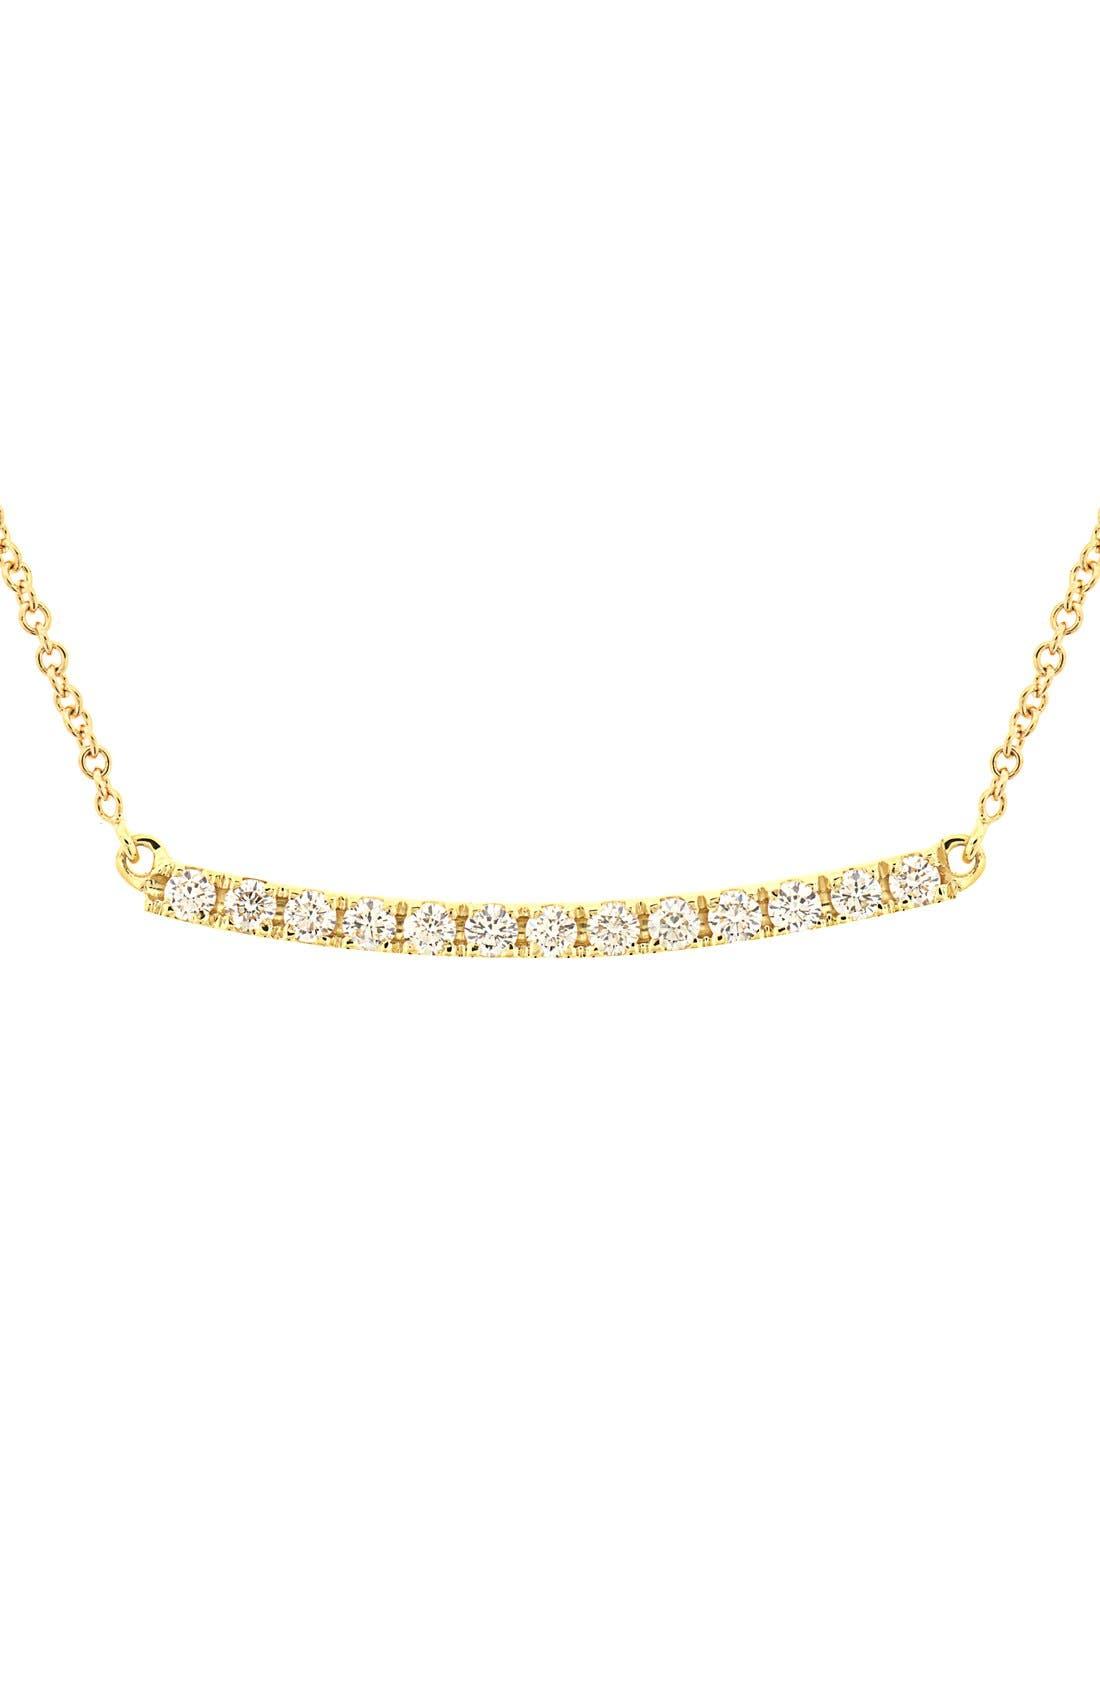 Main Image - Bony Levy 'Stick' Pavé Diamond Bar Necklace (Nordstrom Exclusive)